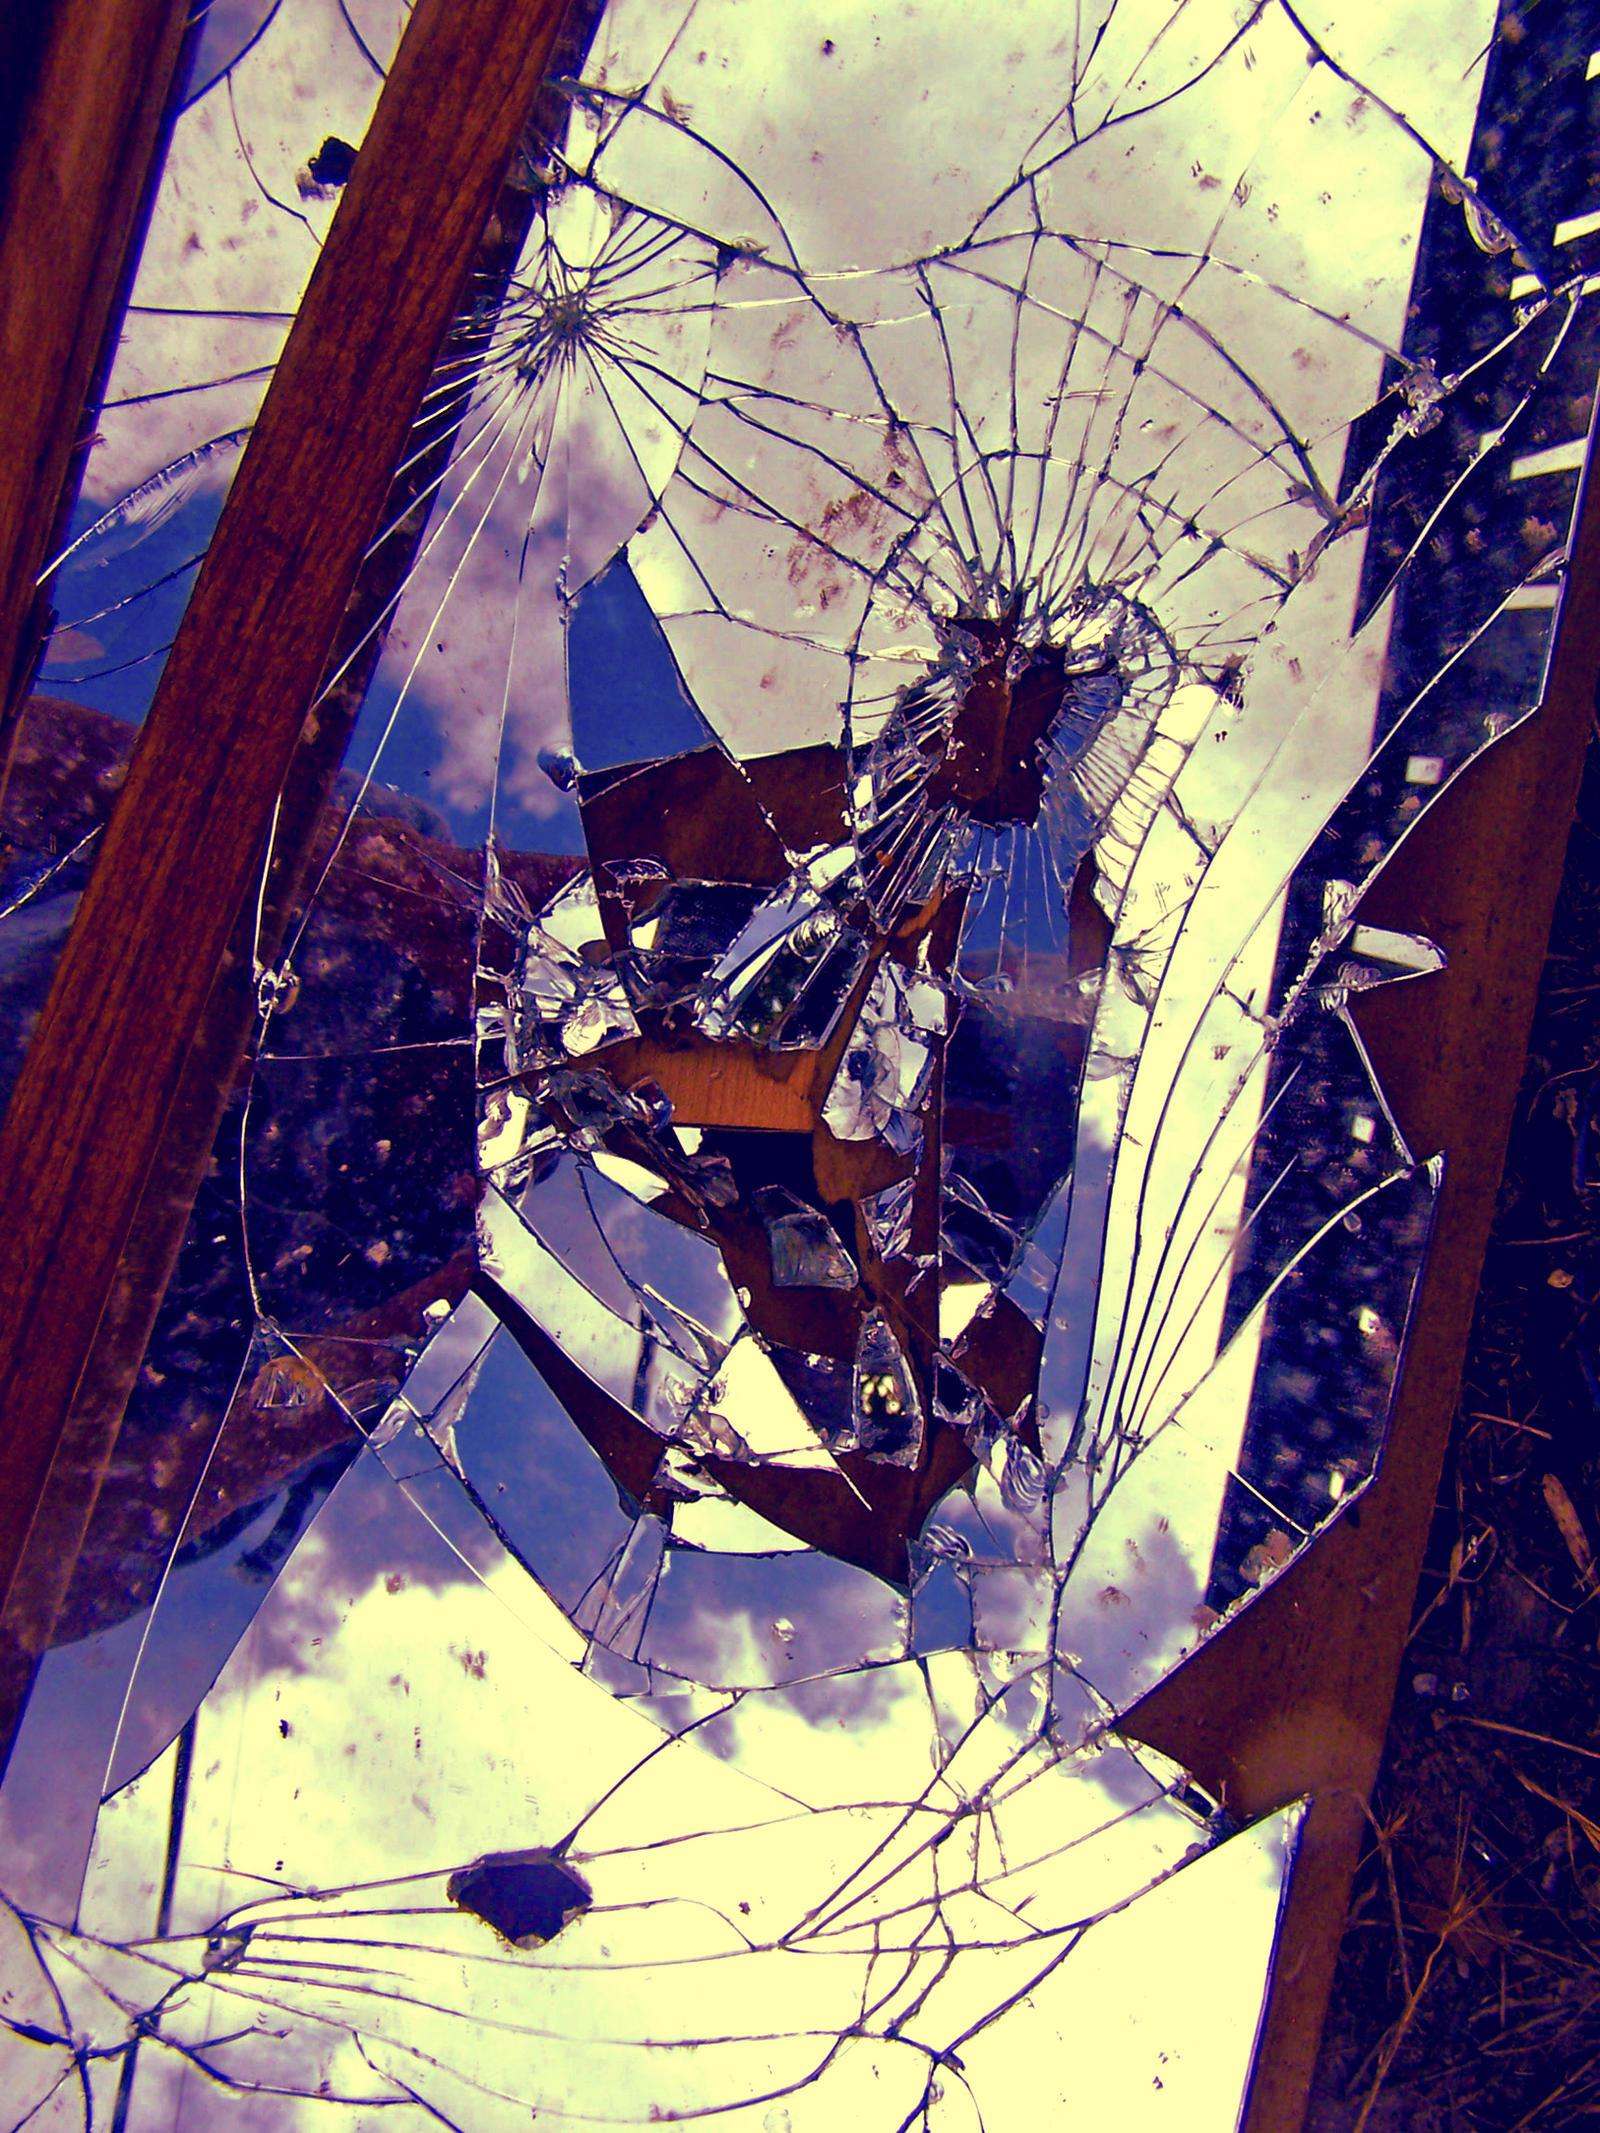 Cracked mirror art for Broken mirror art